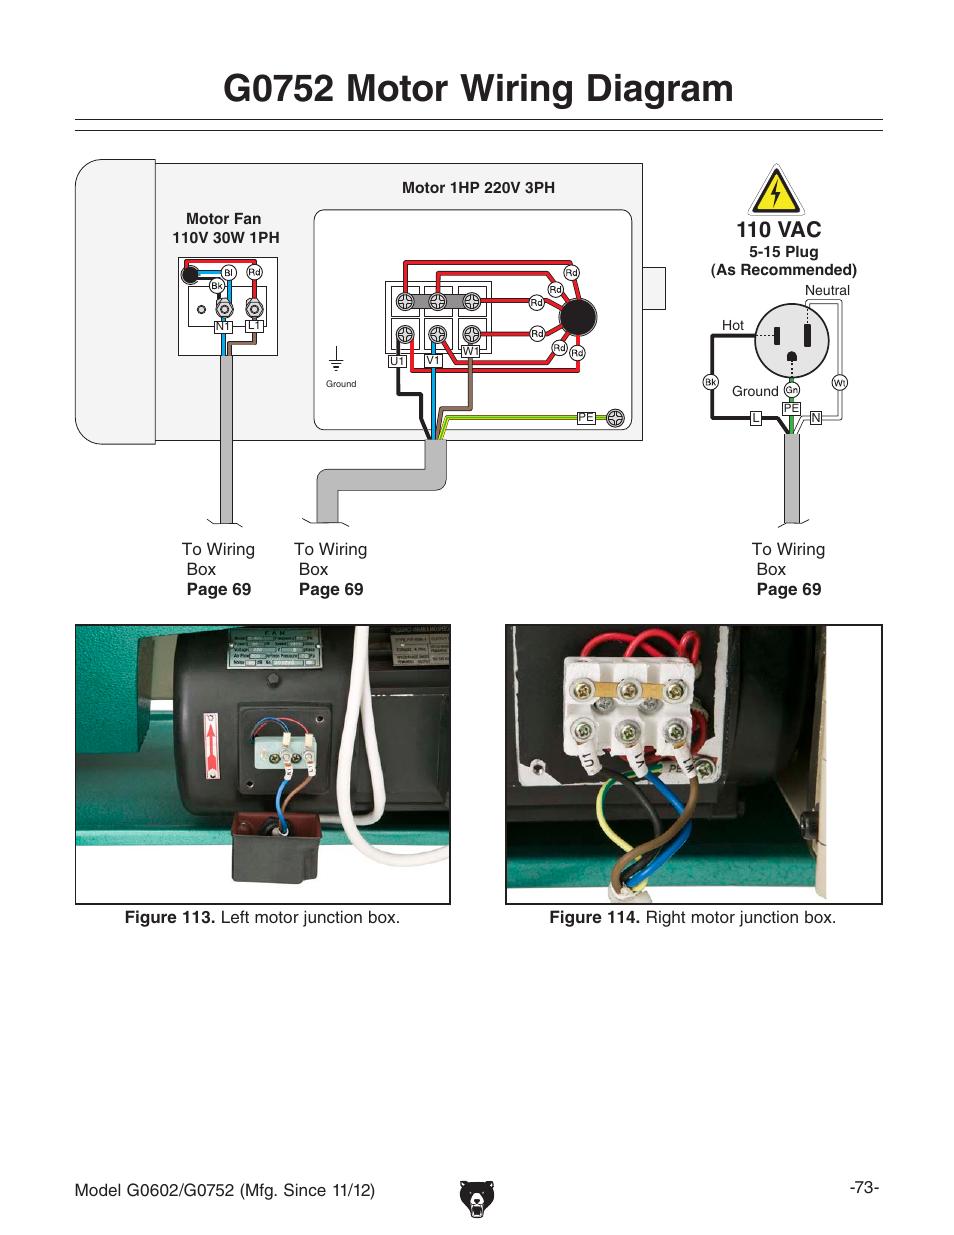 Wiring Manual Pdf  110v 220v Motor Wiring Diagram